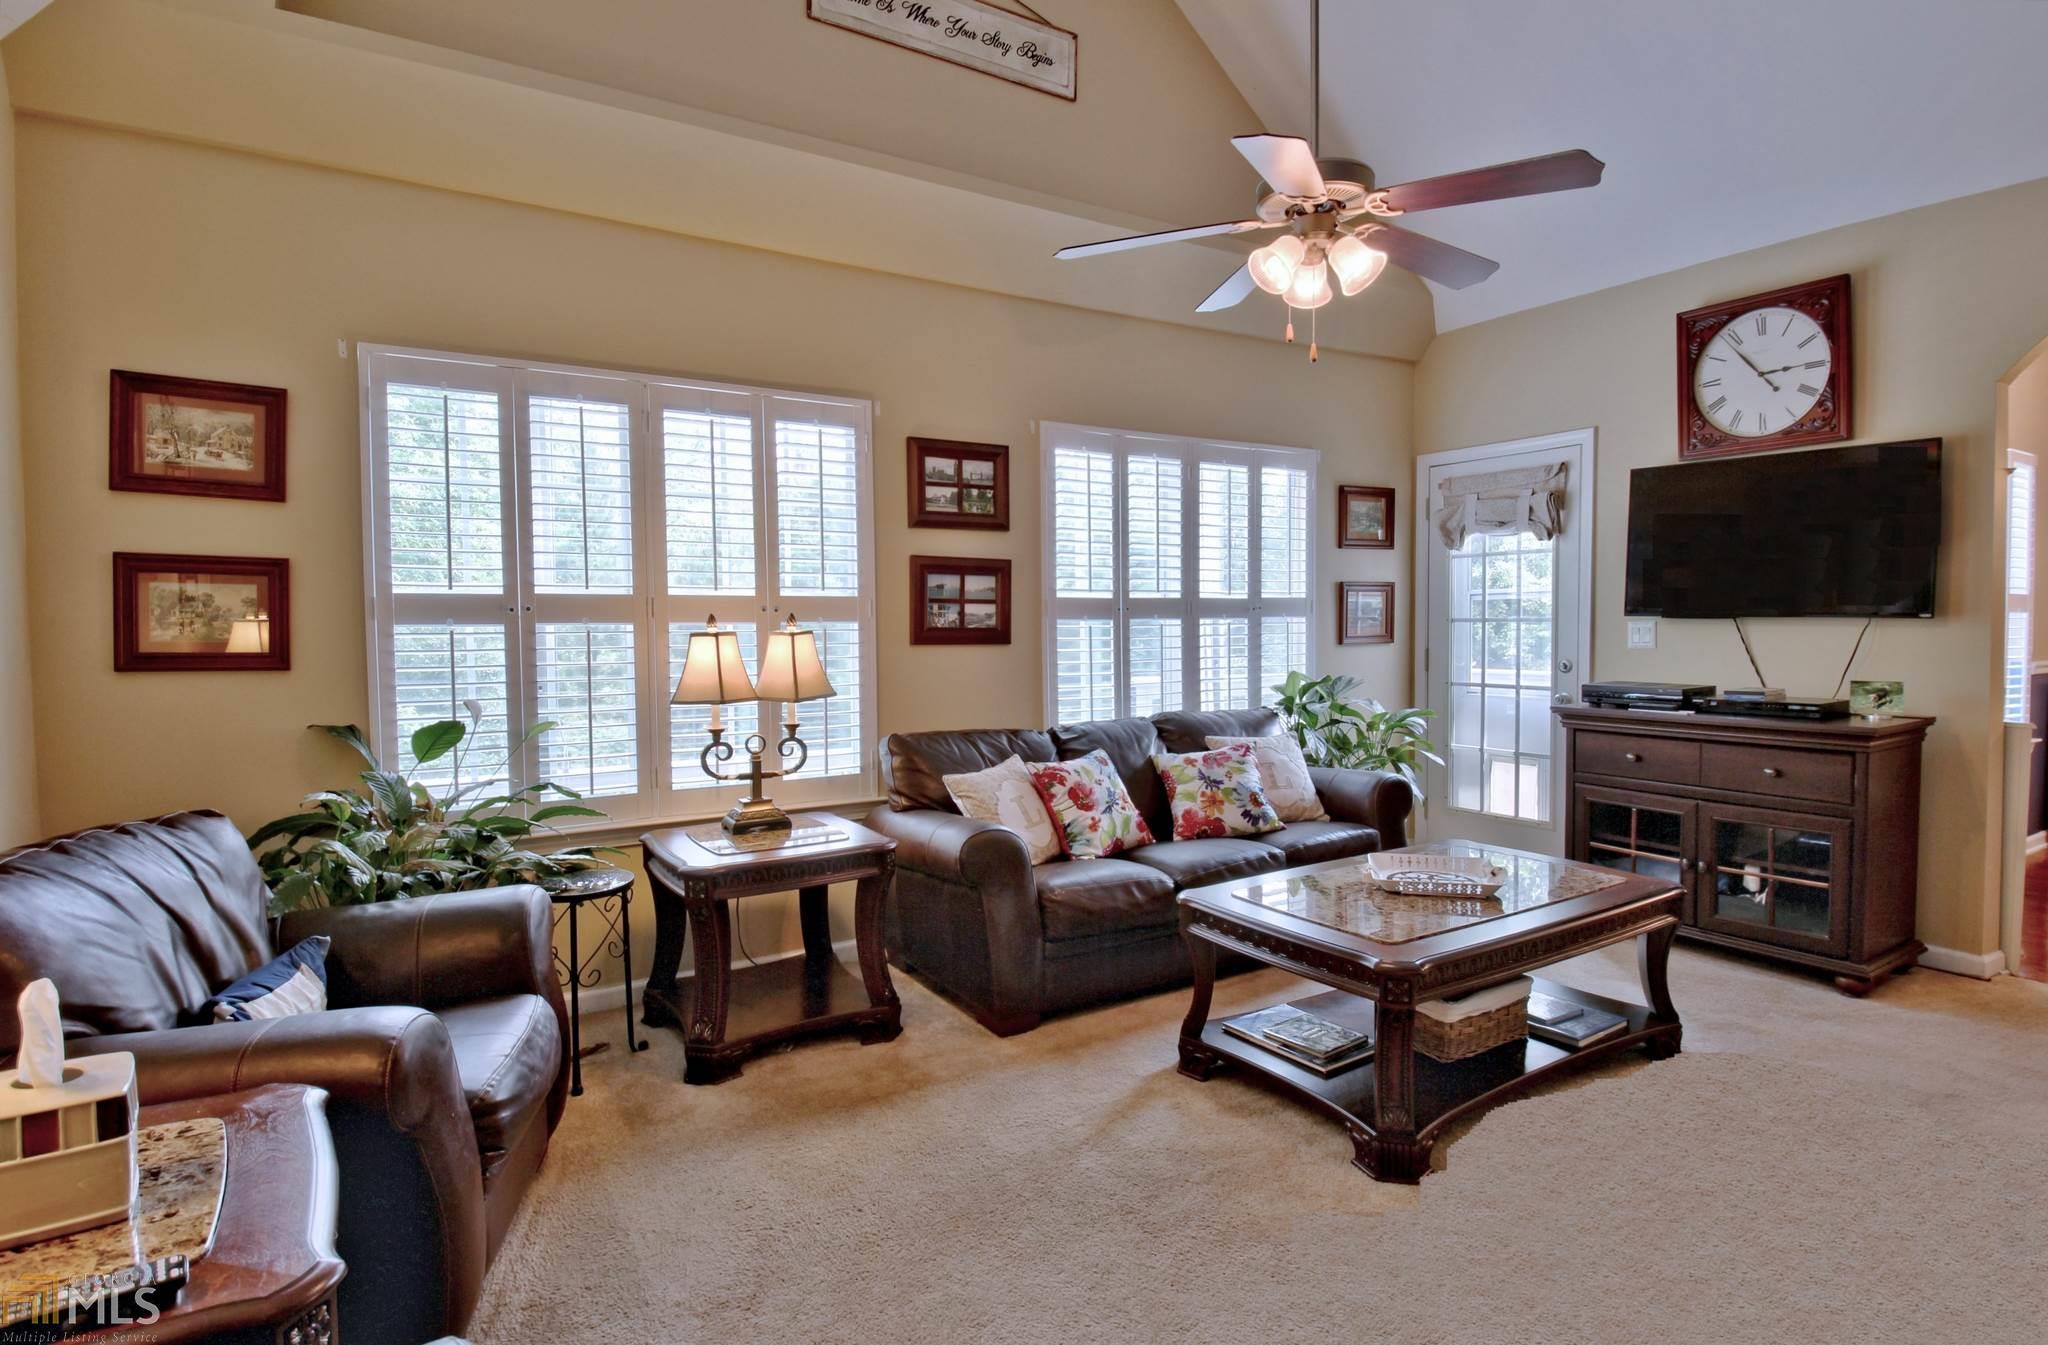 Listing: 81 Garden View Ter, Newnan, GA.| MLS# 8397389 | Jim ...